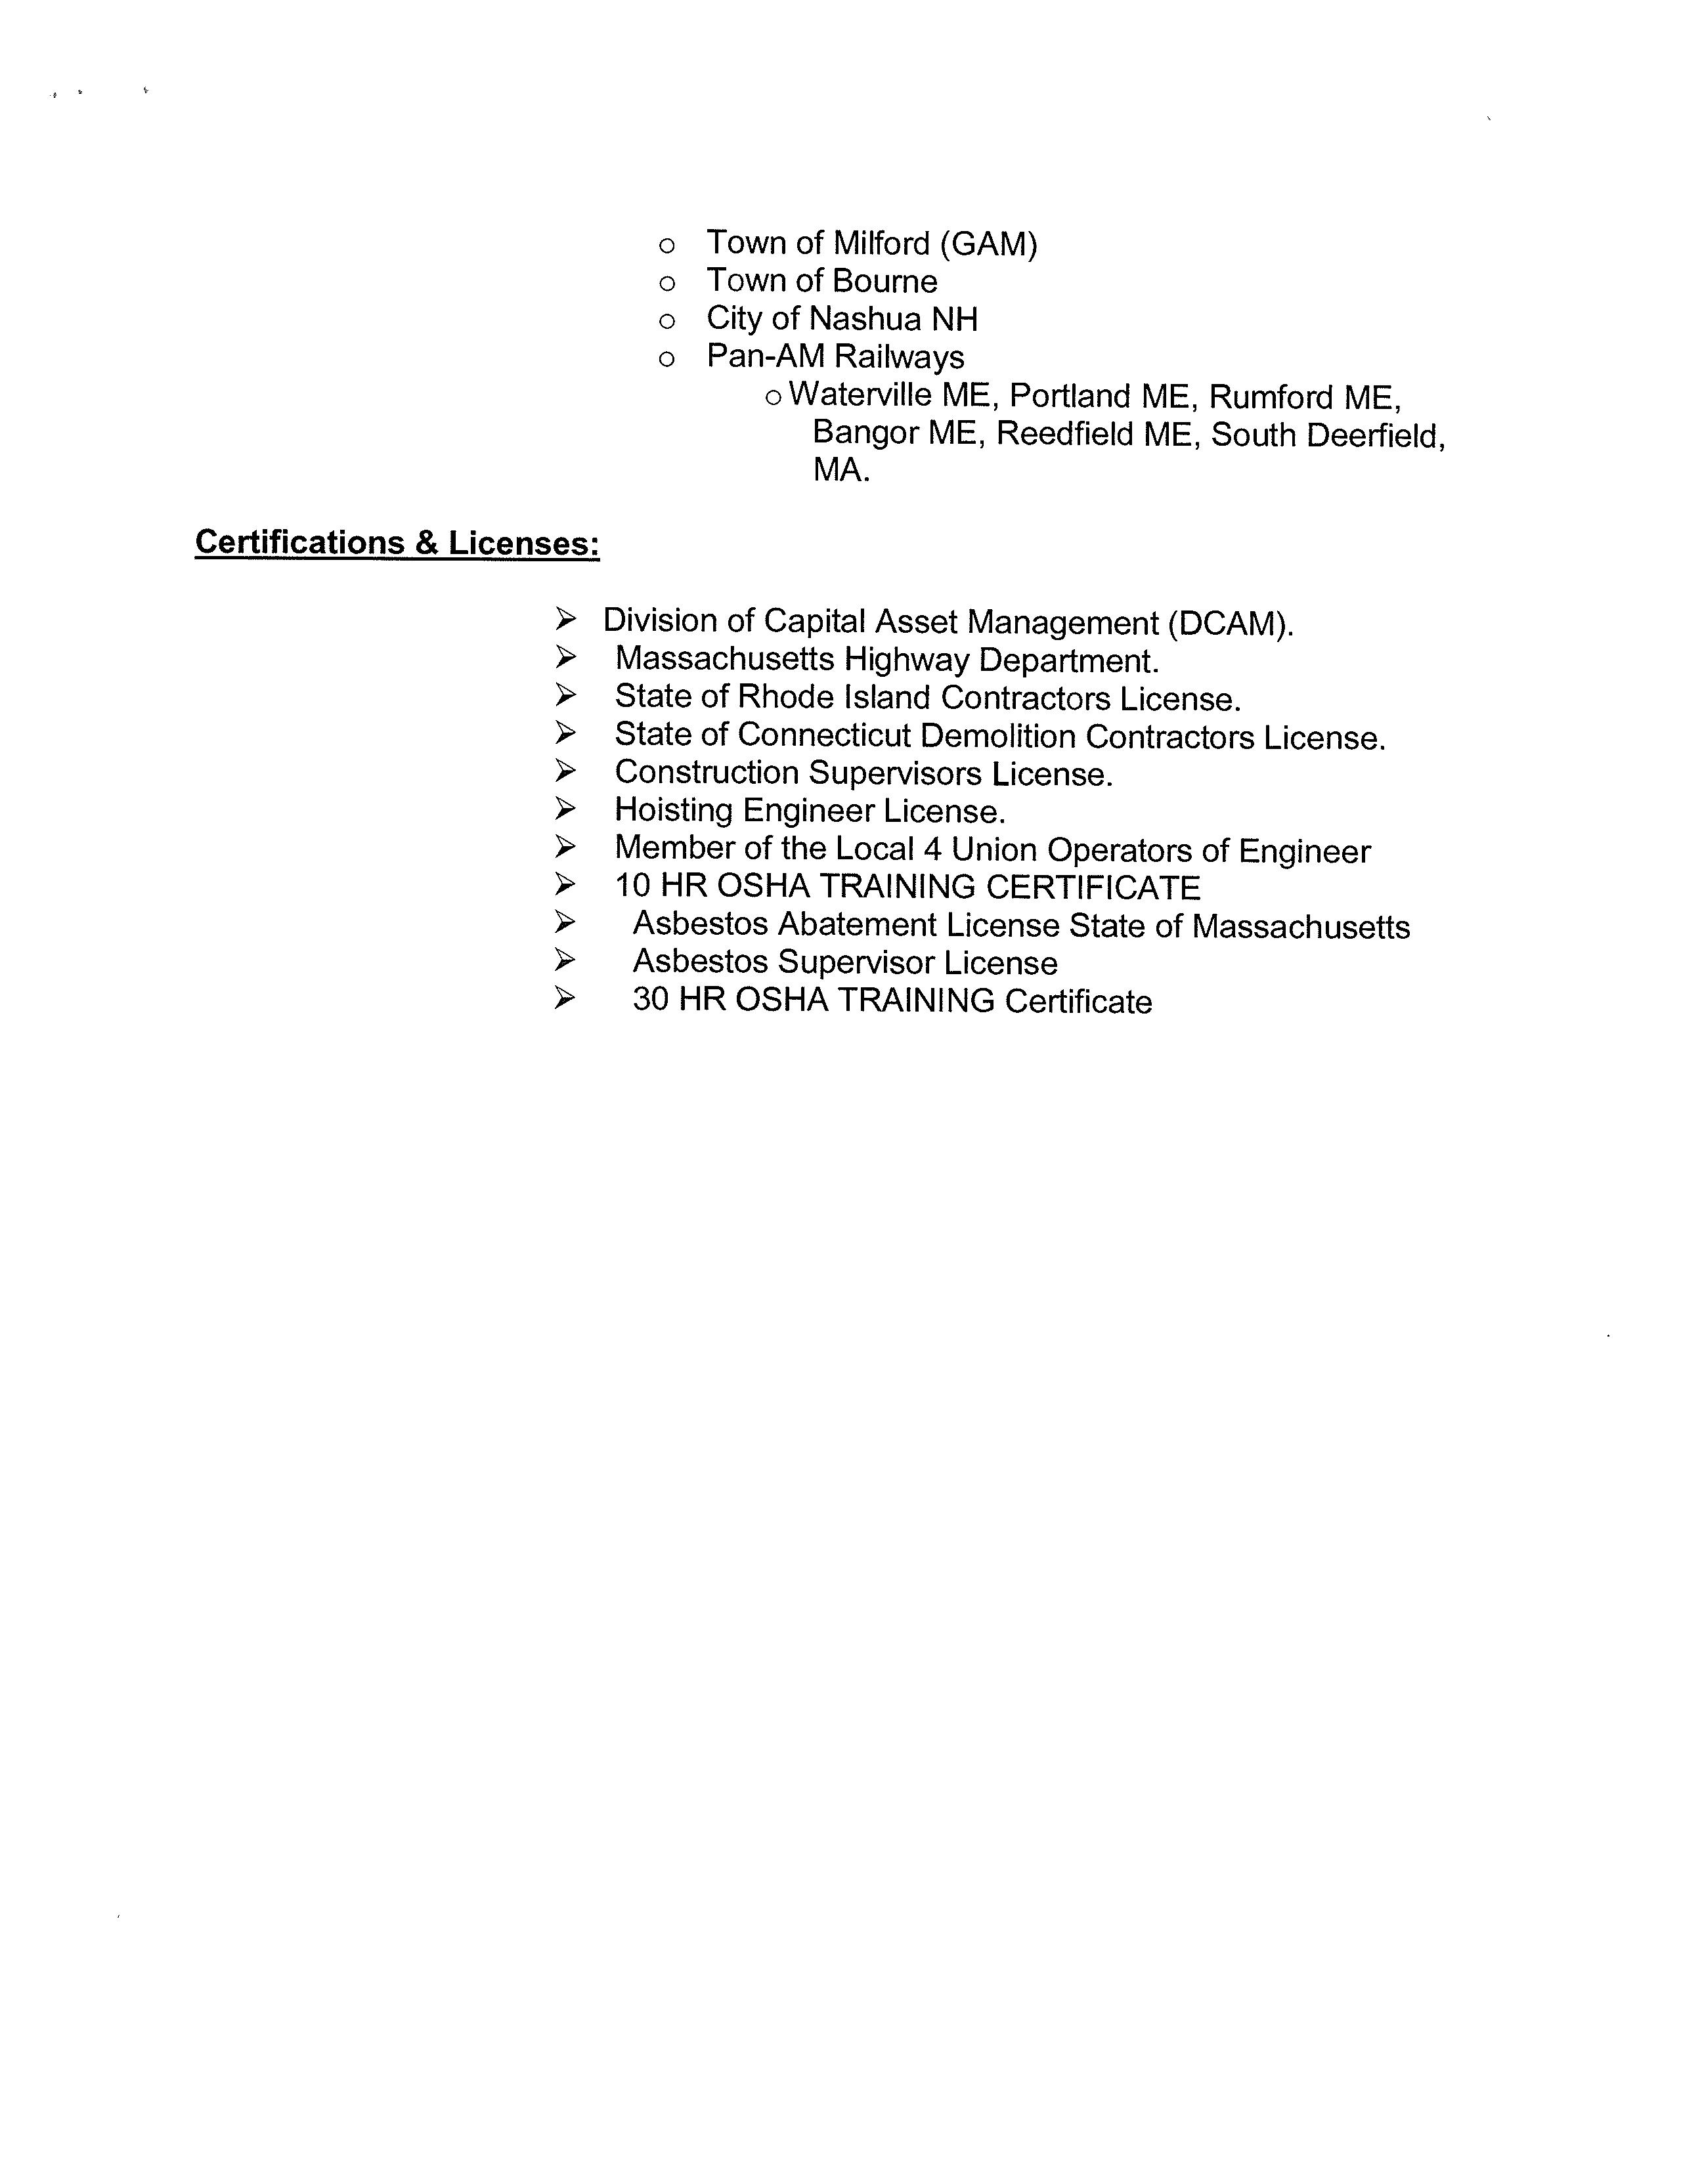 p o box 1915 duxbury ma 02331 certifications licenses